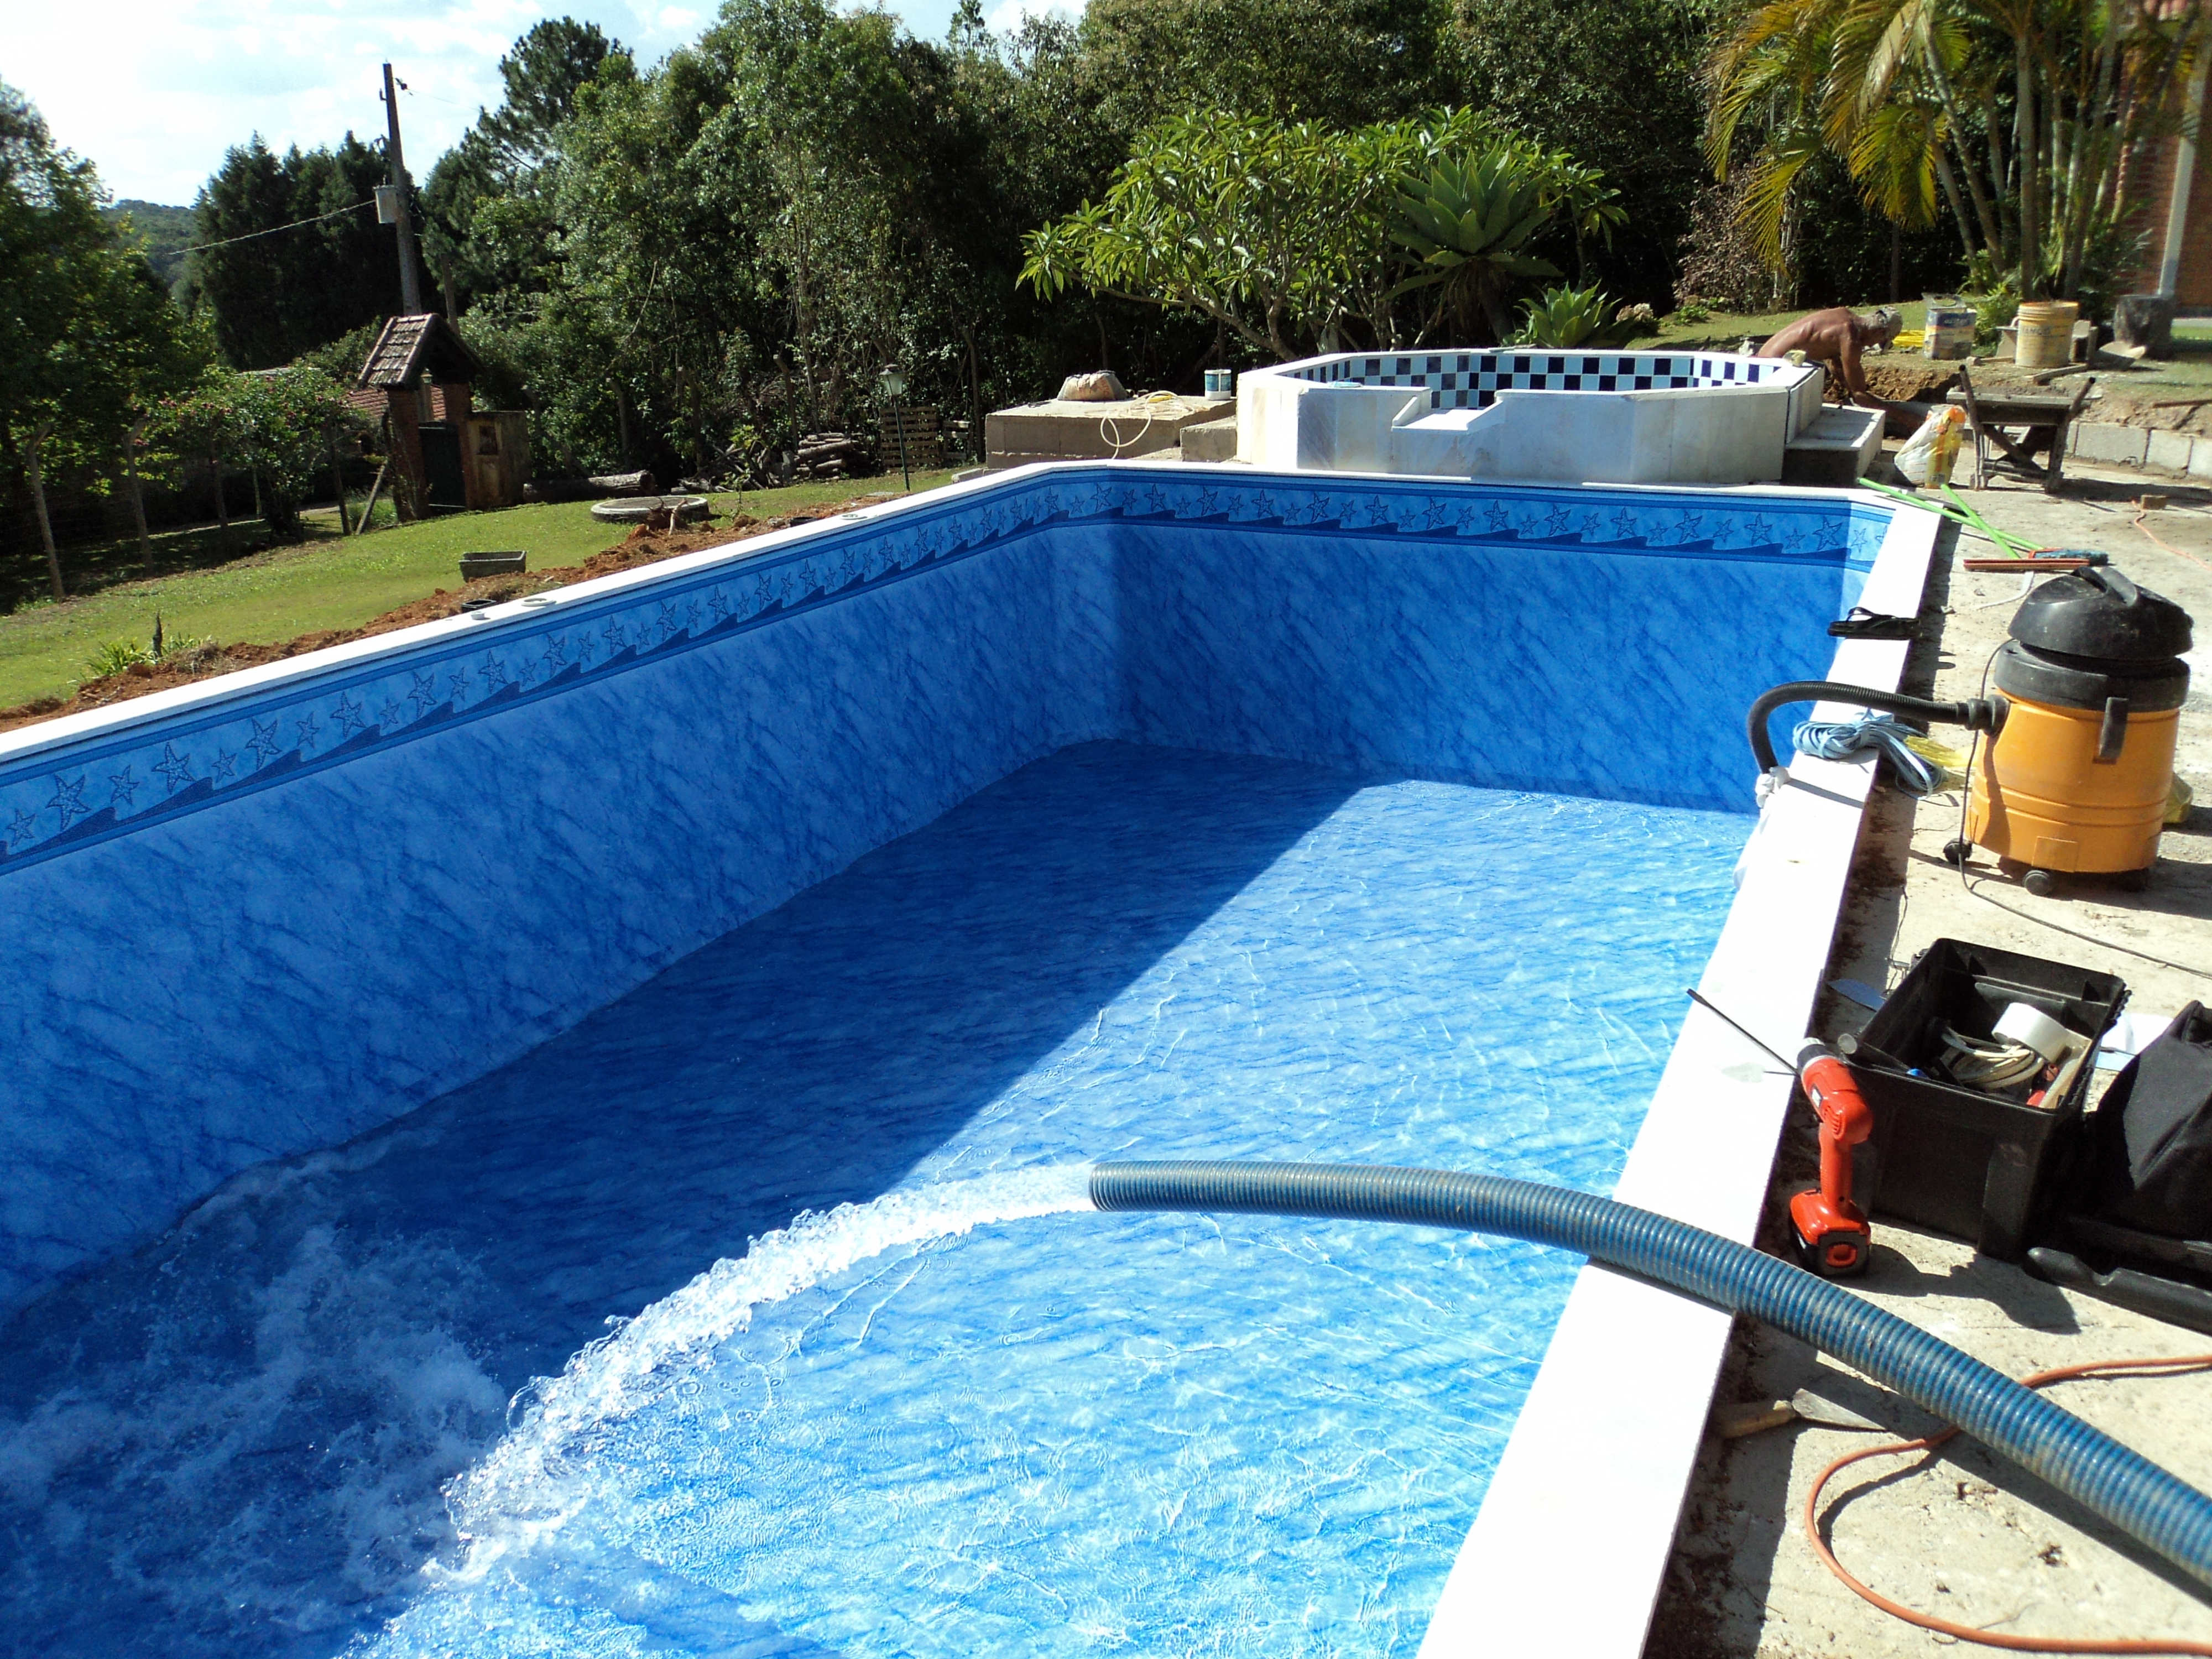 Piscina constru o henrique 9 viegas constru es for Motor para depuradora de piscina